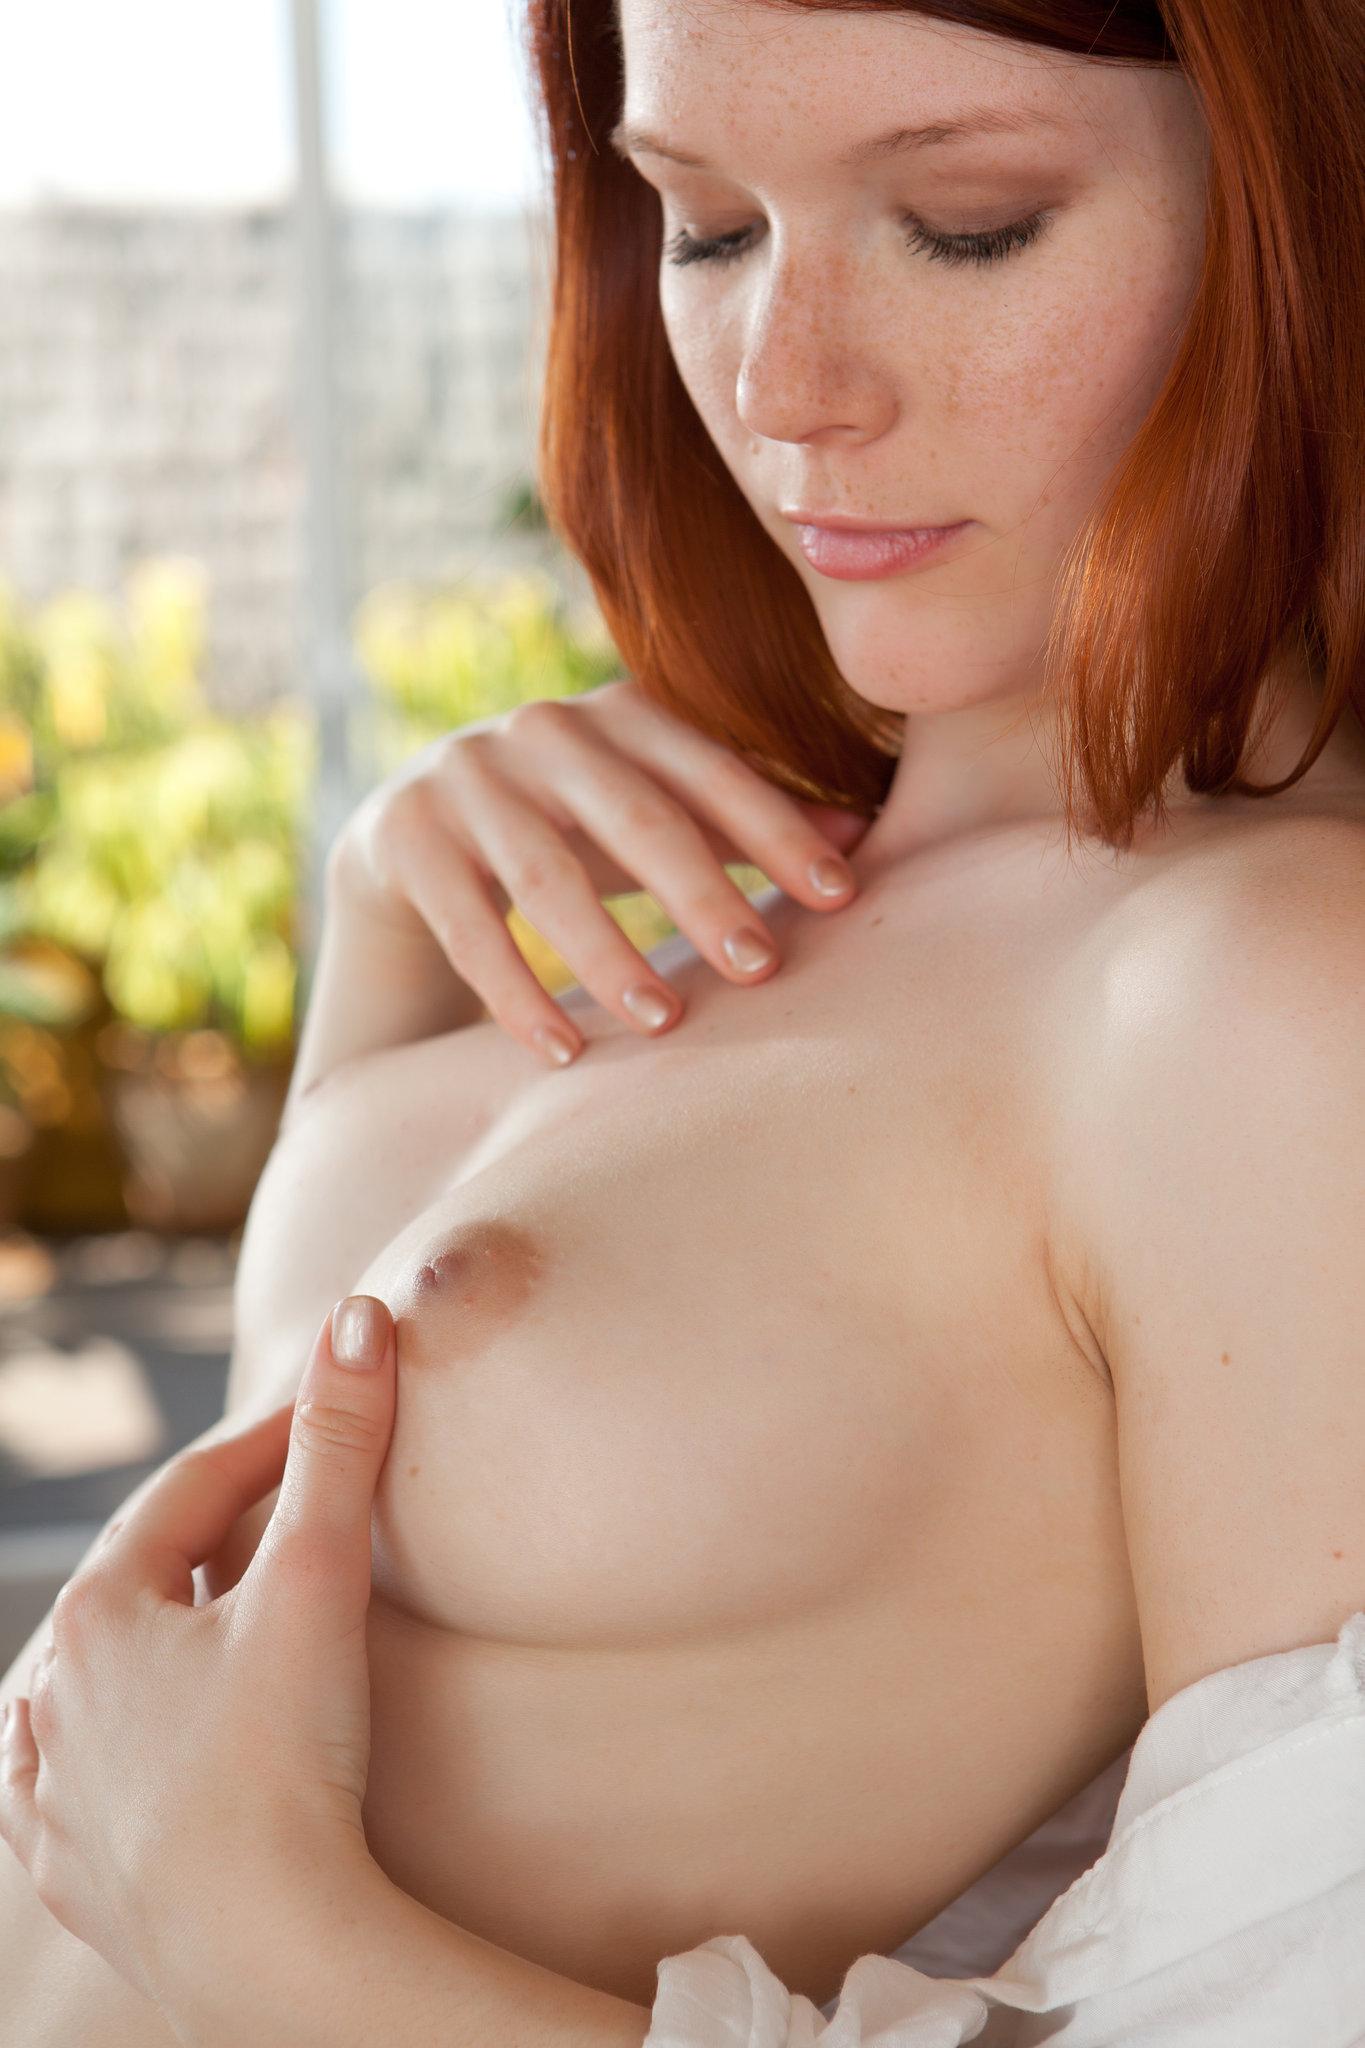 Cute Redhead Mia in White - NudesPuri.com